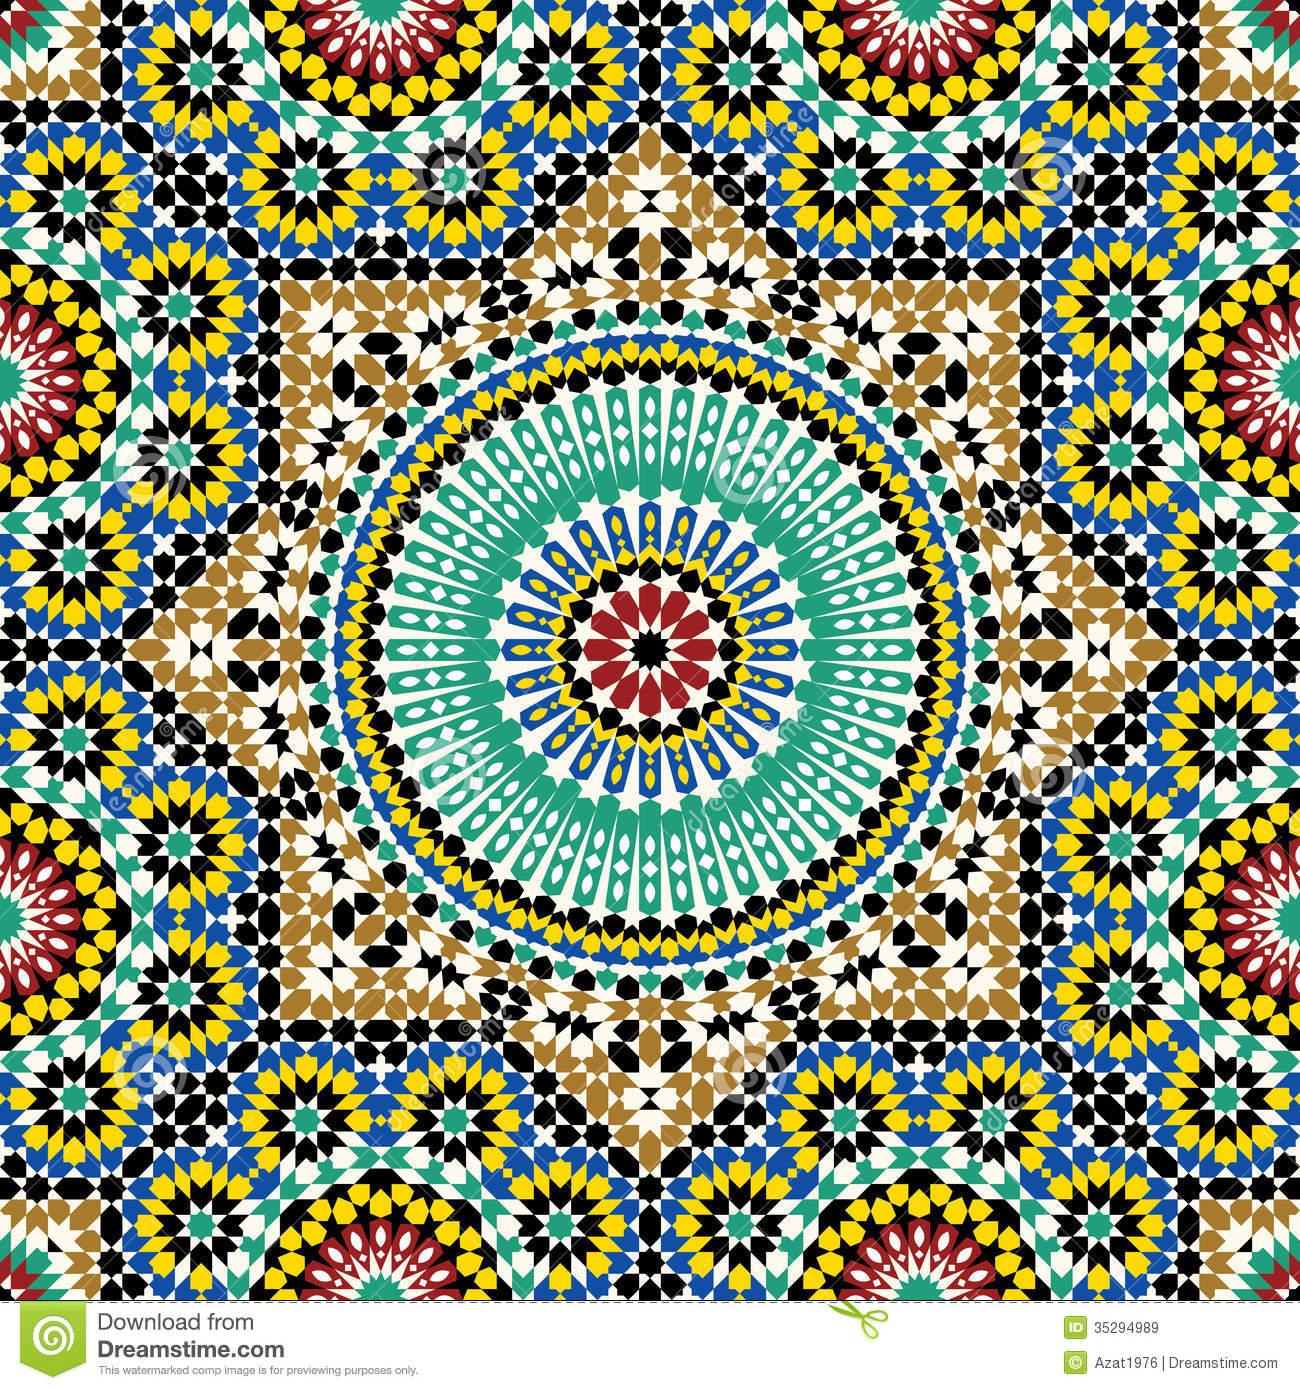 Moroccan patterns clipart vector transparent Moroccan patterns clipart - ClipartFest vector transparent